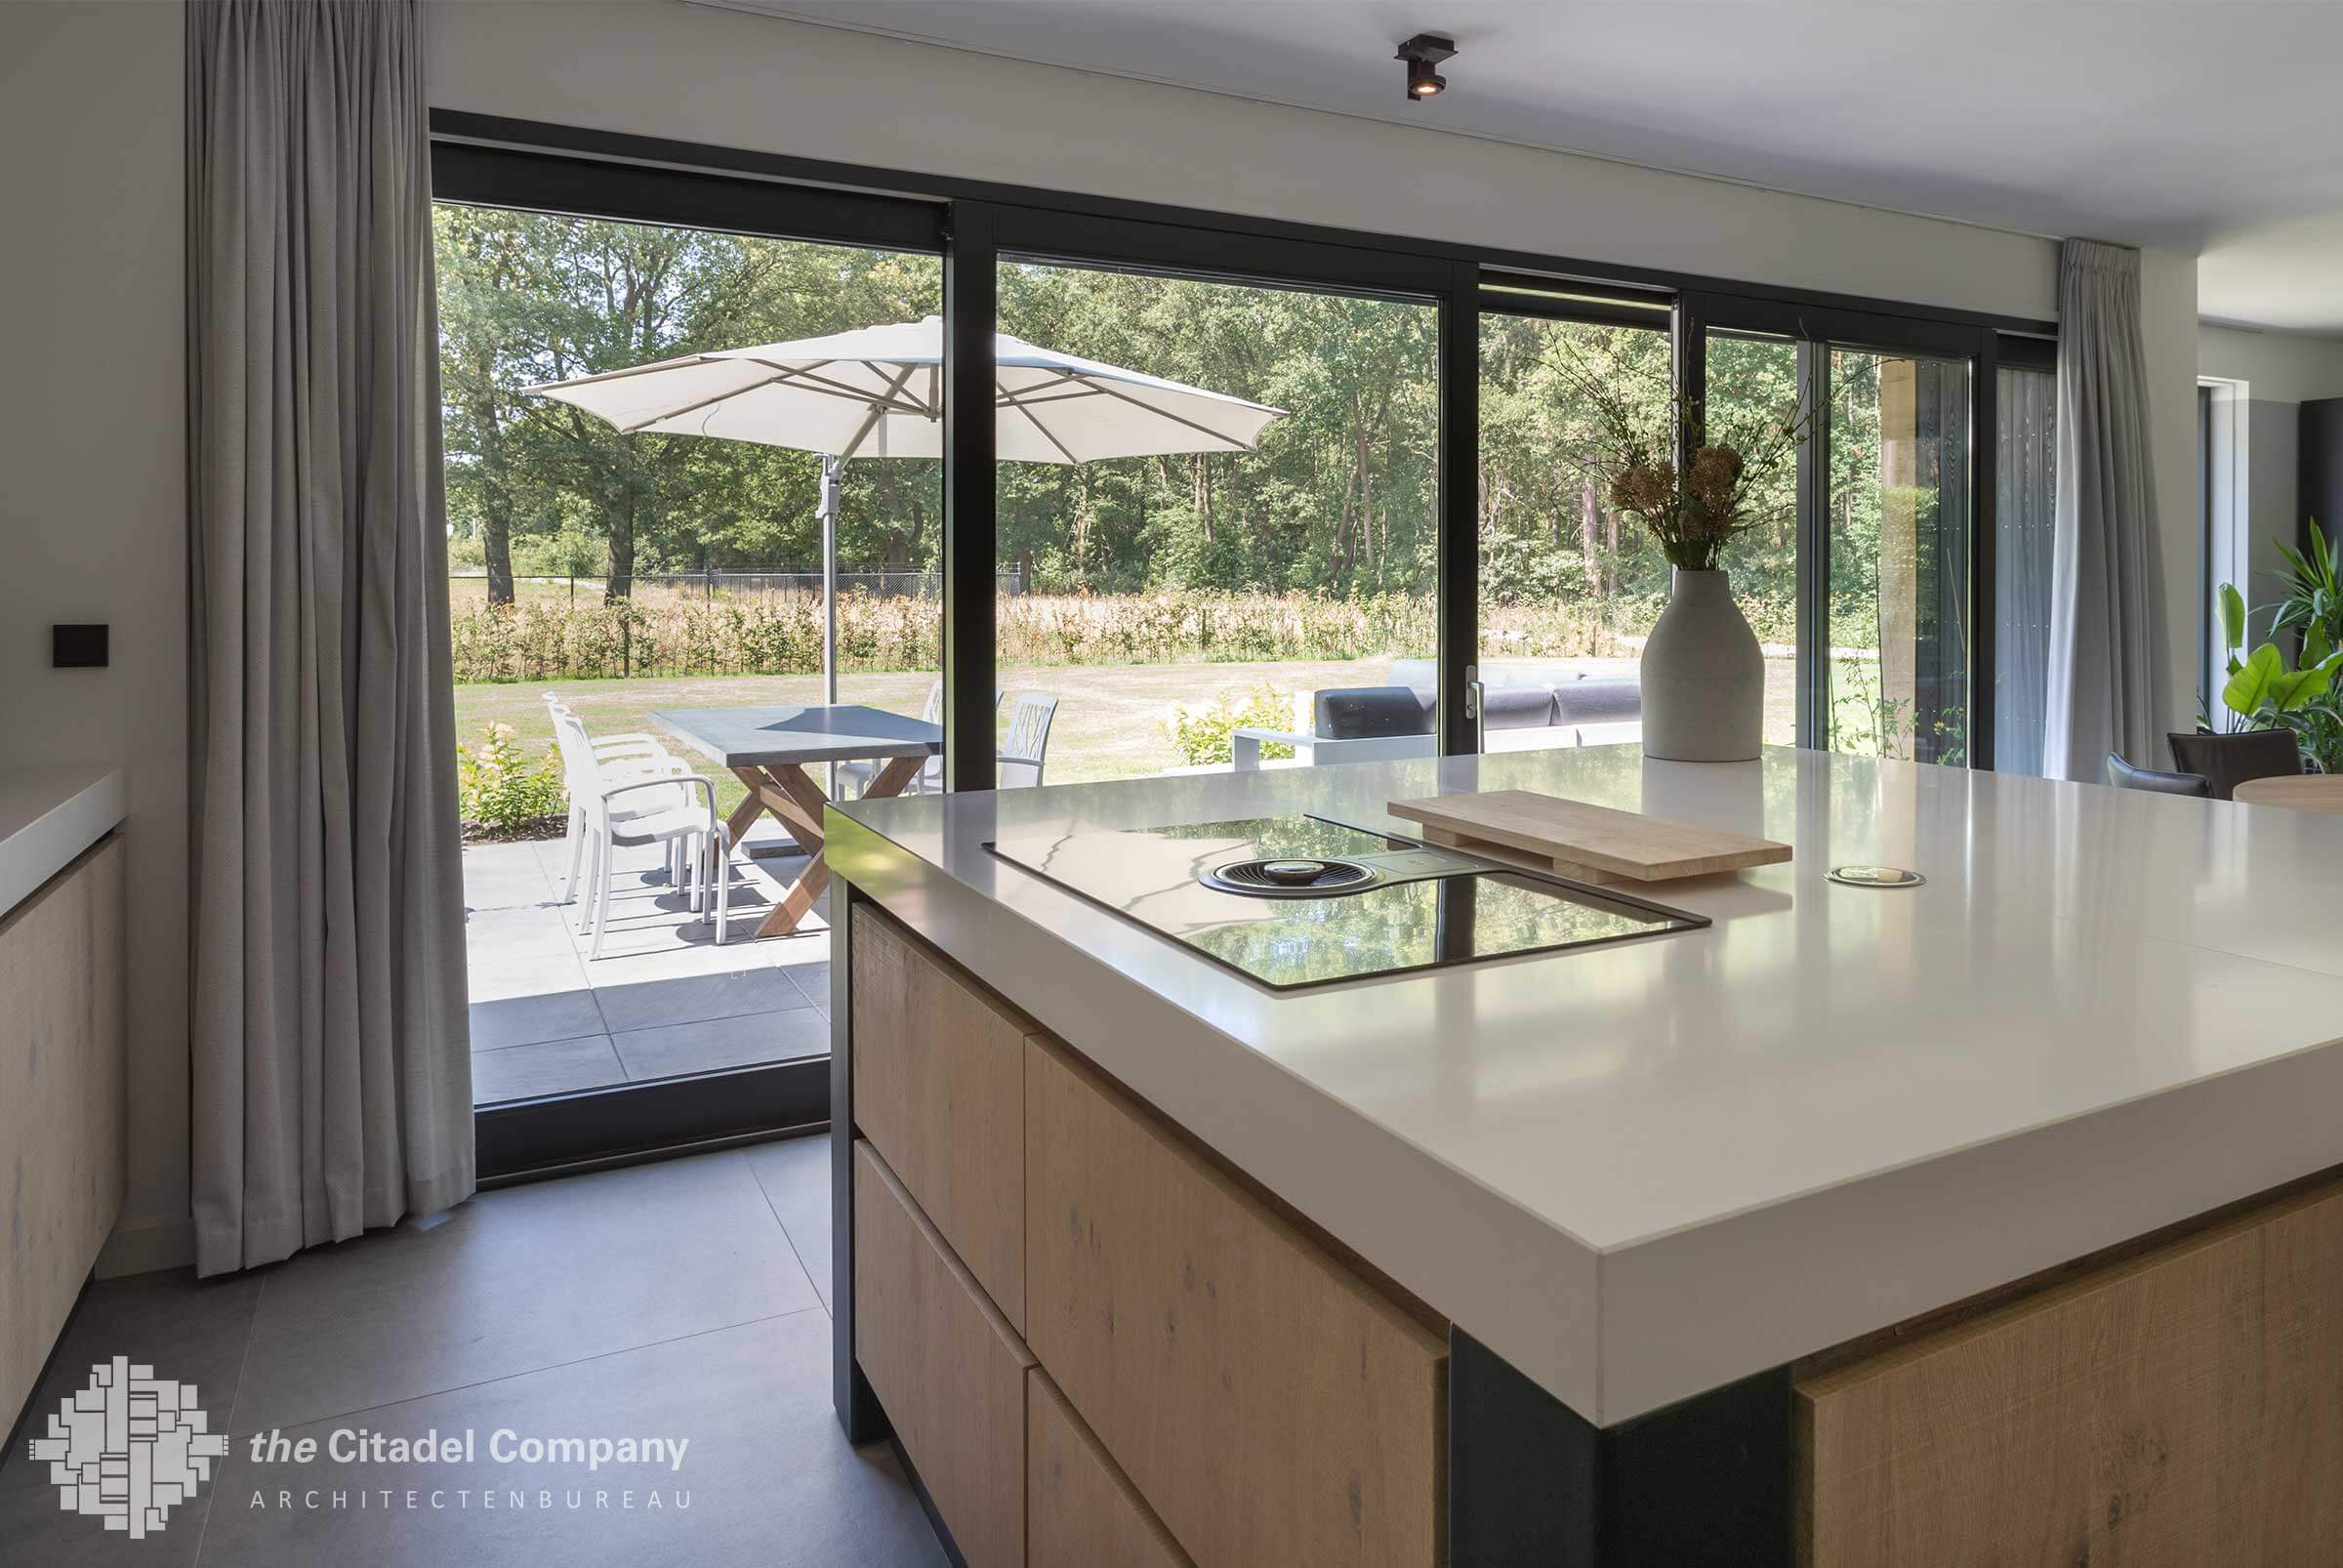 Landelijke villa boerenerf Ommen